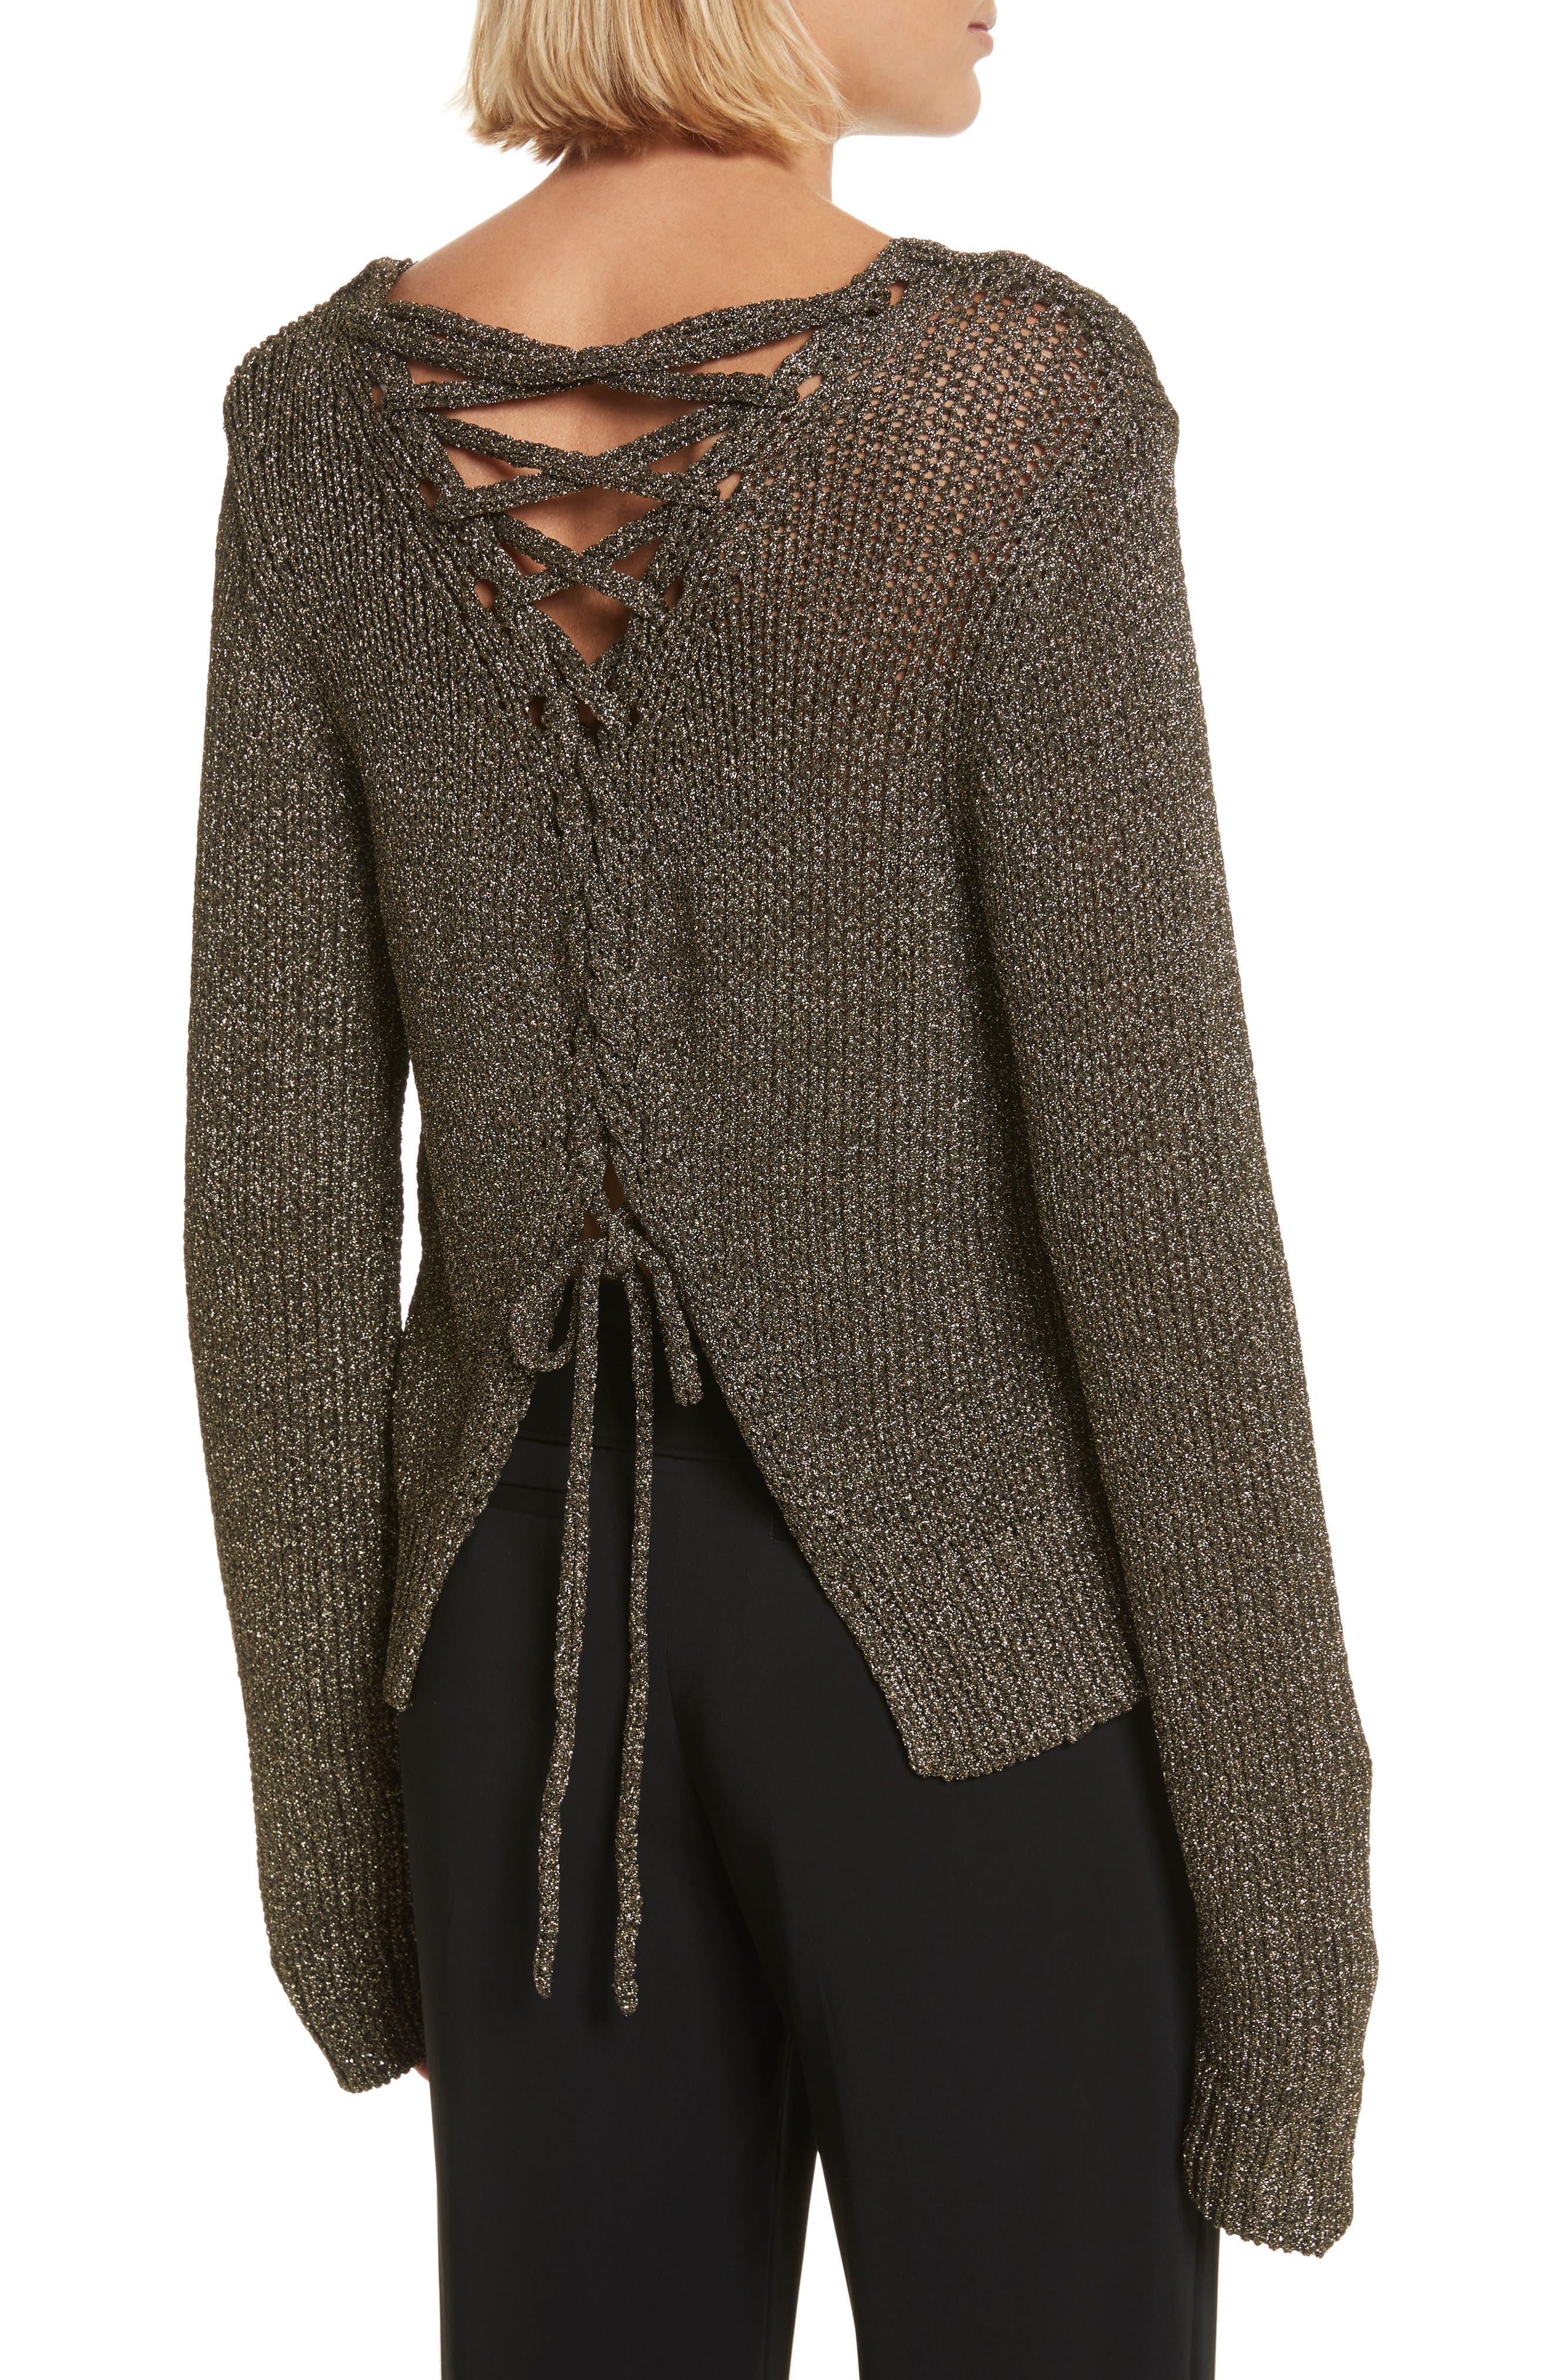 Main Image - A.L.C. Marjorie Lace-Up Back Sweater